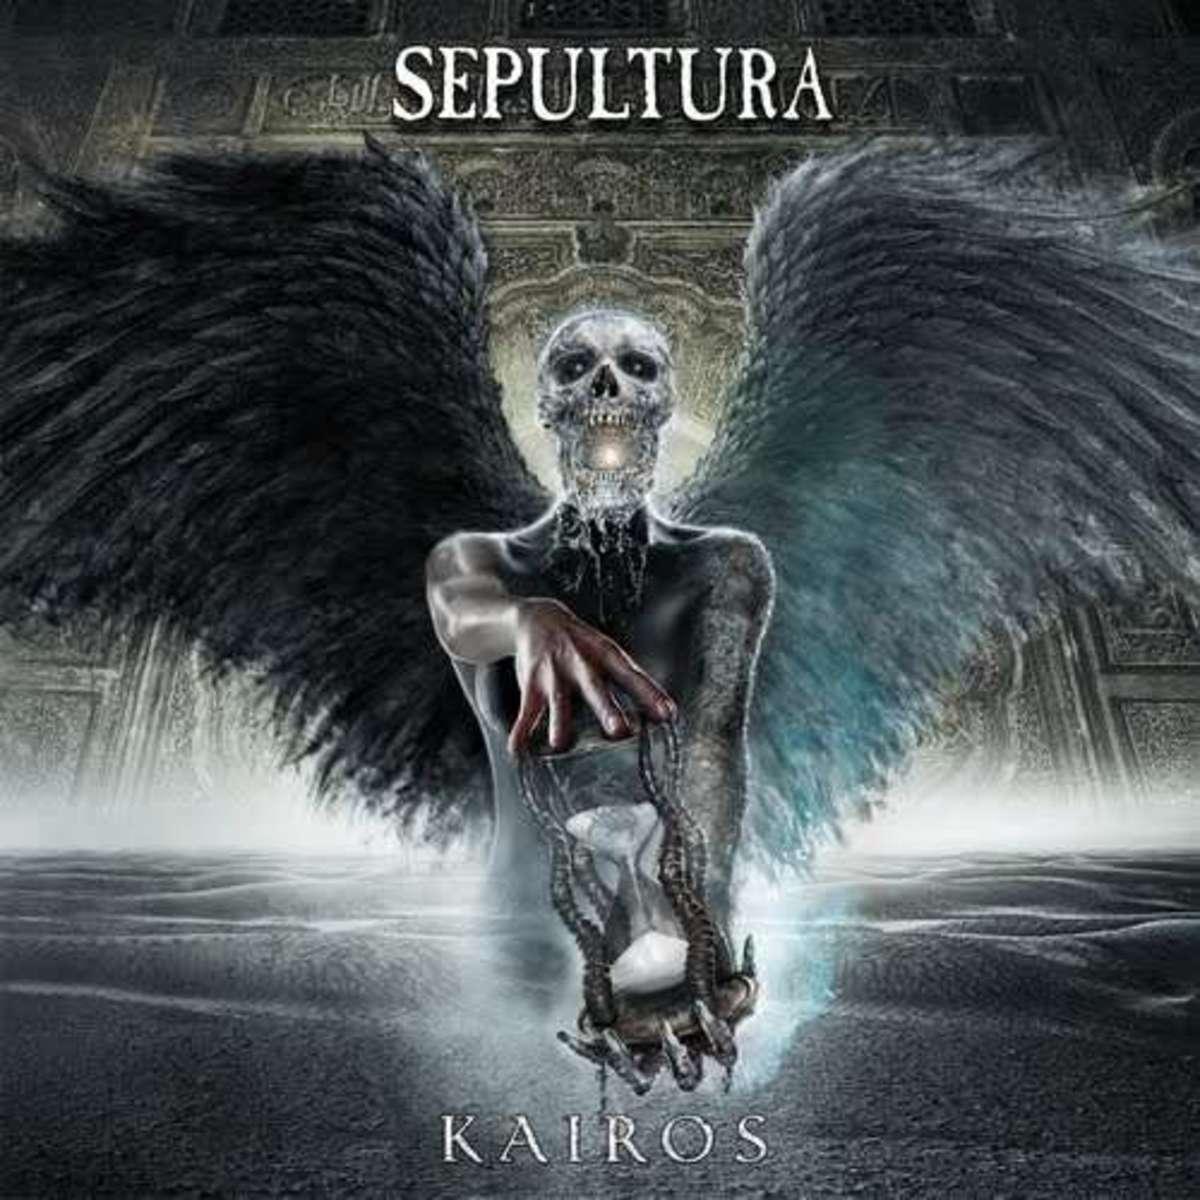 review-of-the-album-kairos-by-sepultura